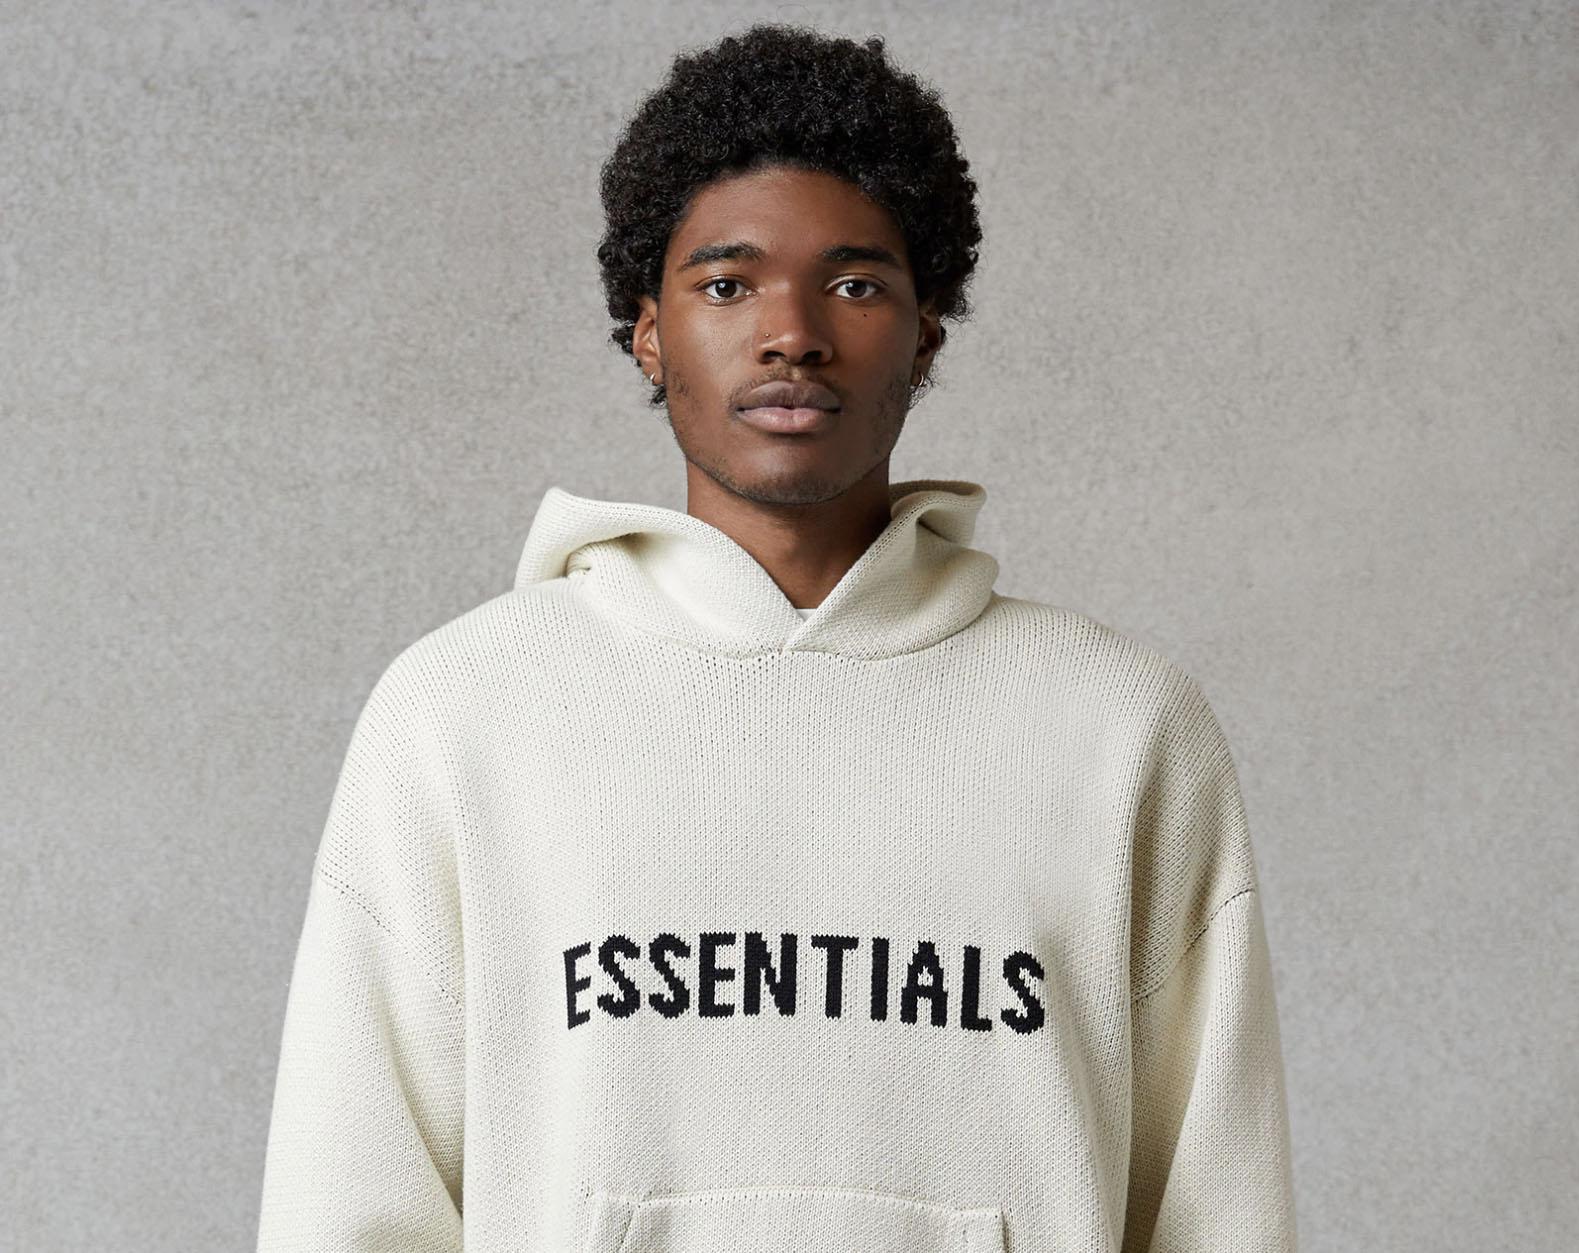 Next Essentials Drop